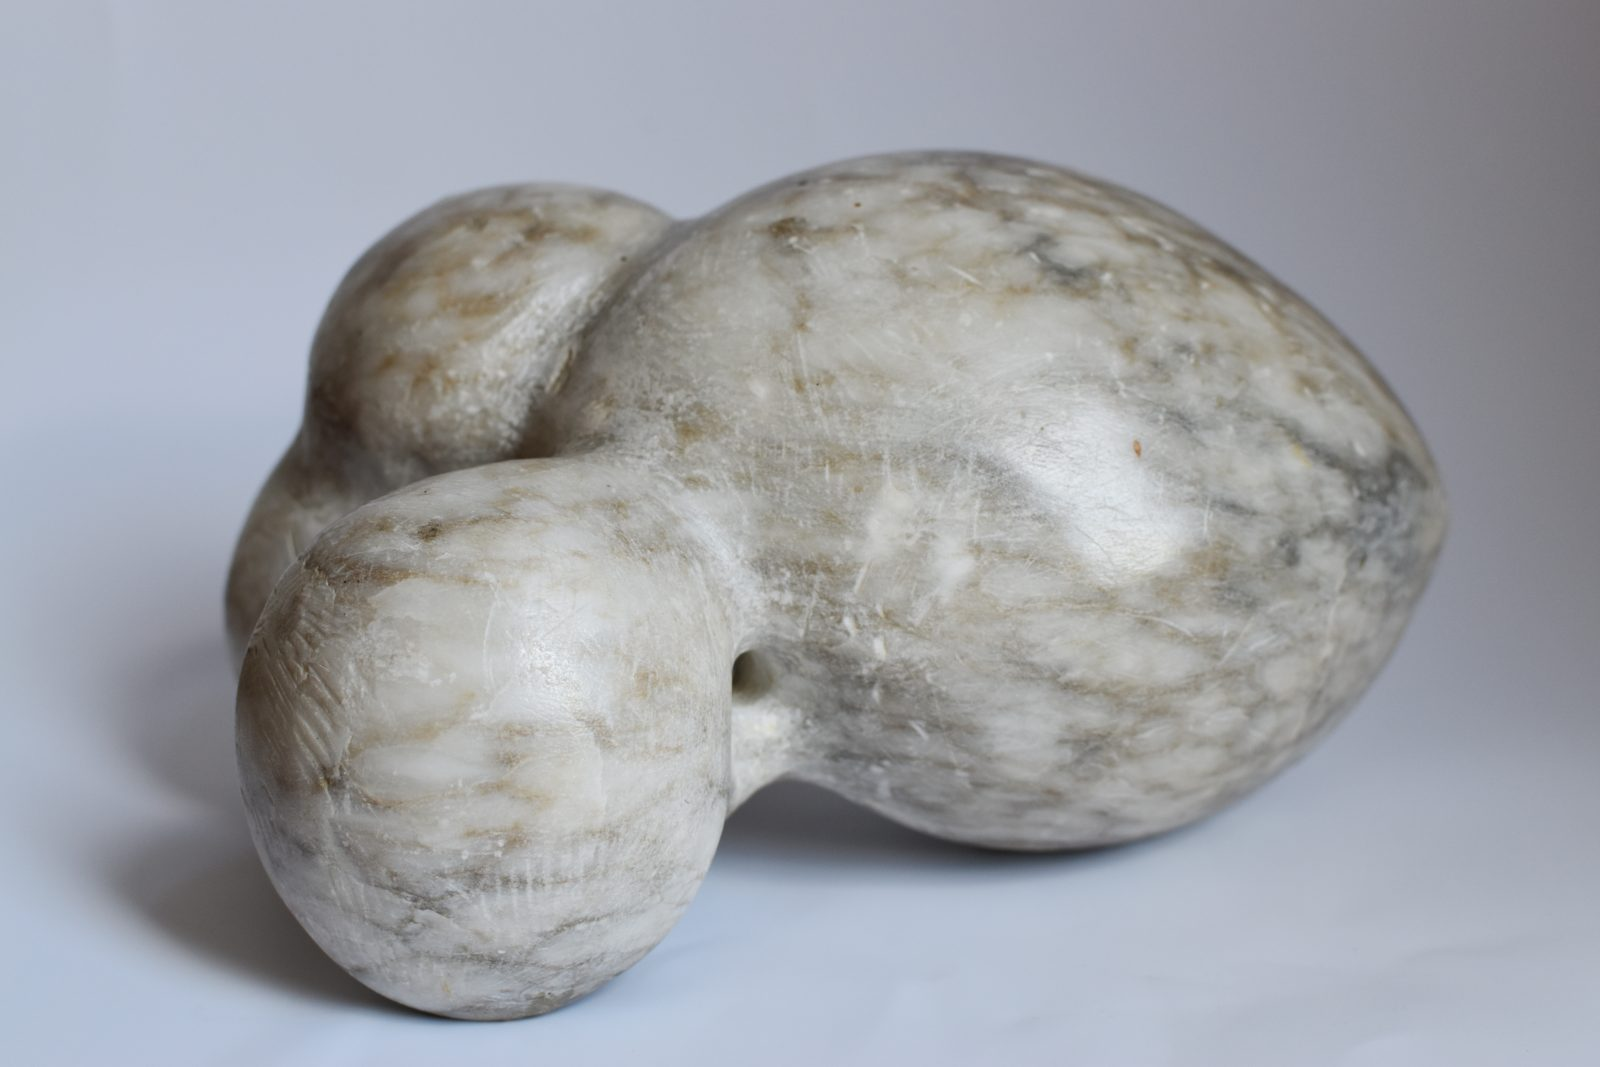 NÖ Waldviertel Galerie Kunst - Hermann Walenta